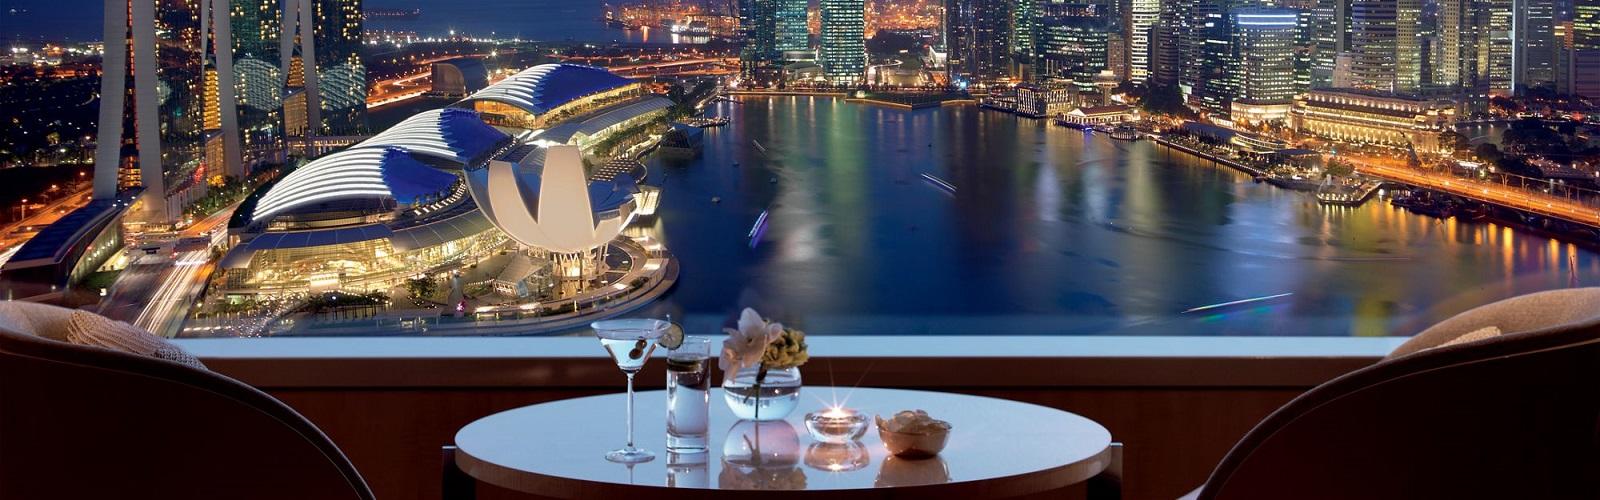 4.f1-hotels-singapore.